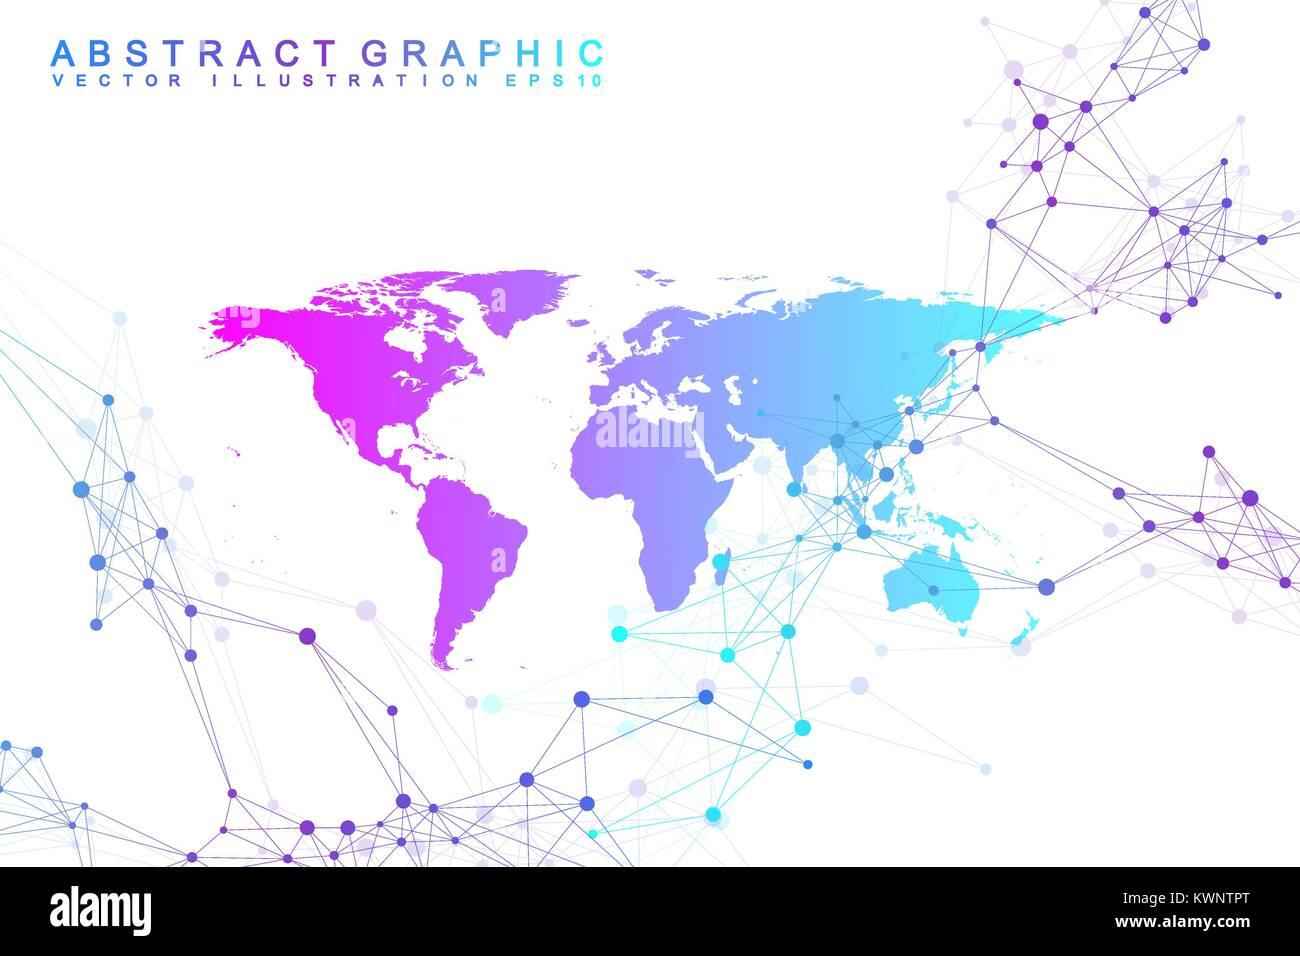 Political world map with global technology networking concept stock political world map with global technology networking concept digital data visualization lines plexus big data background communication gumiabroncs Choice Image